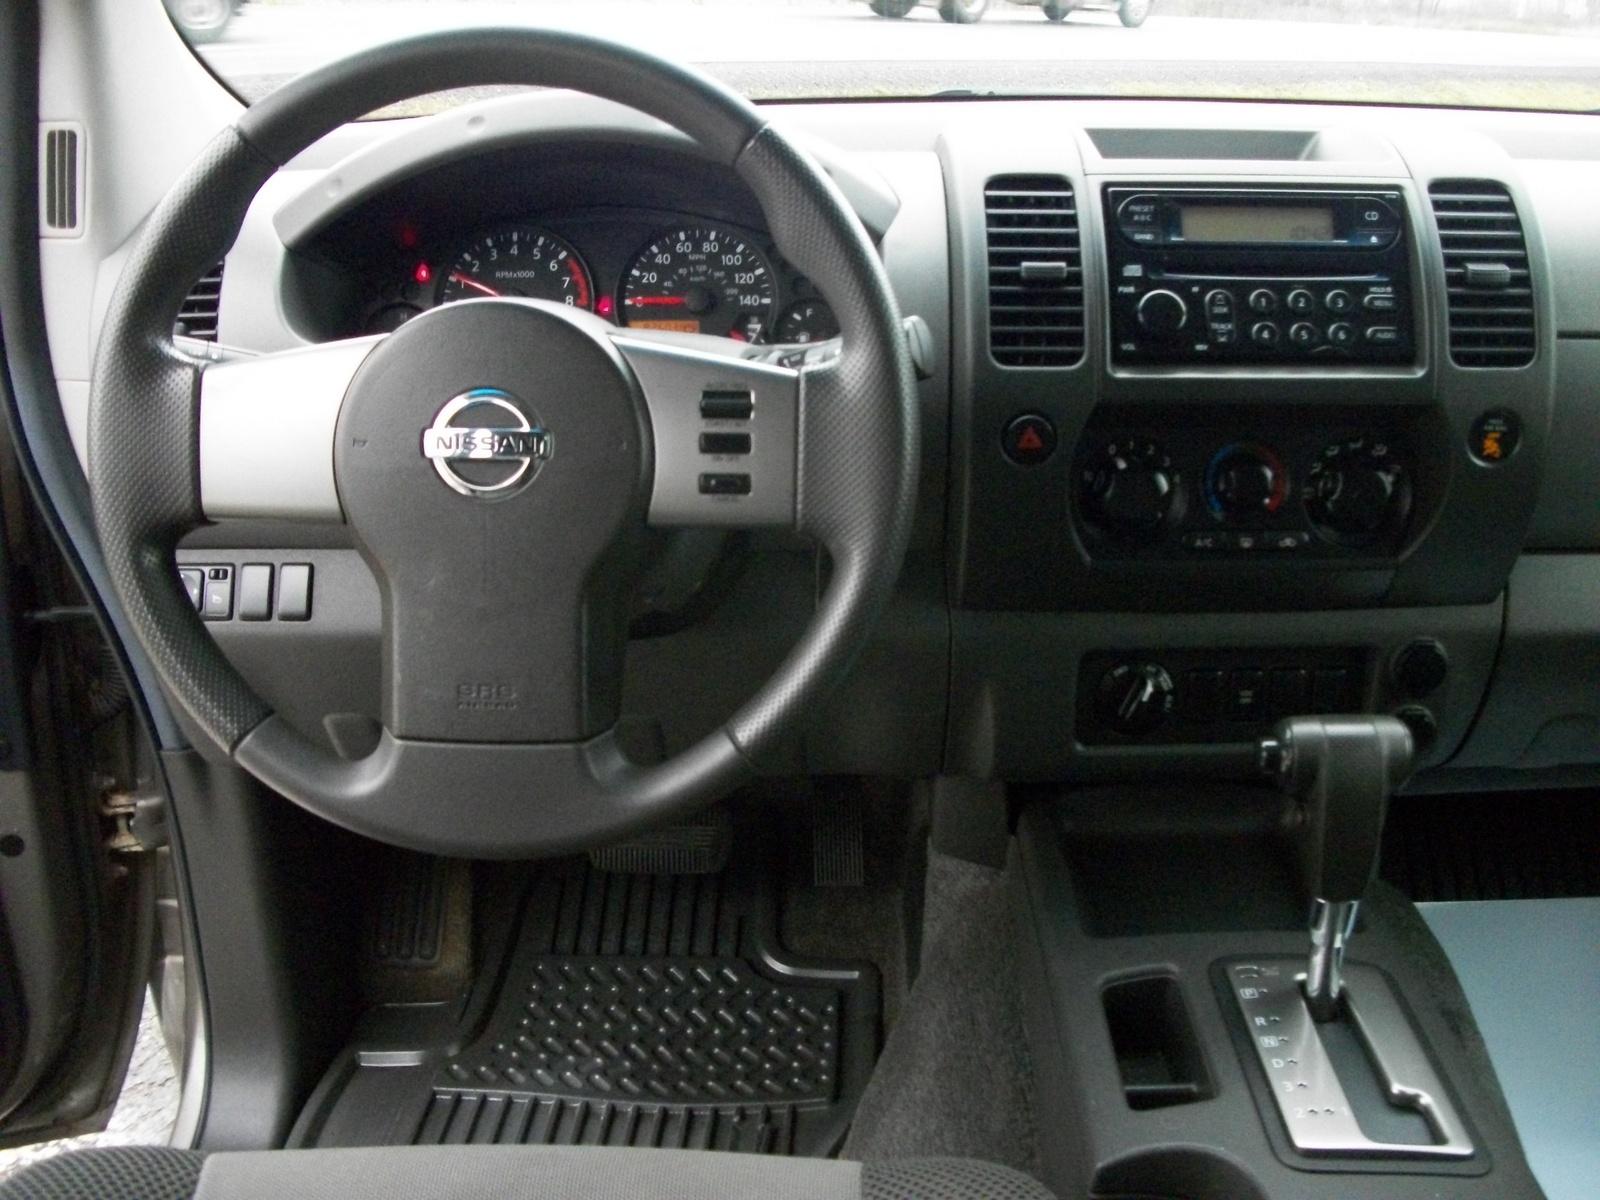 Nissan Xterra Dimensions 2005